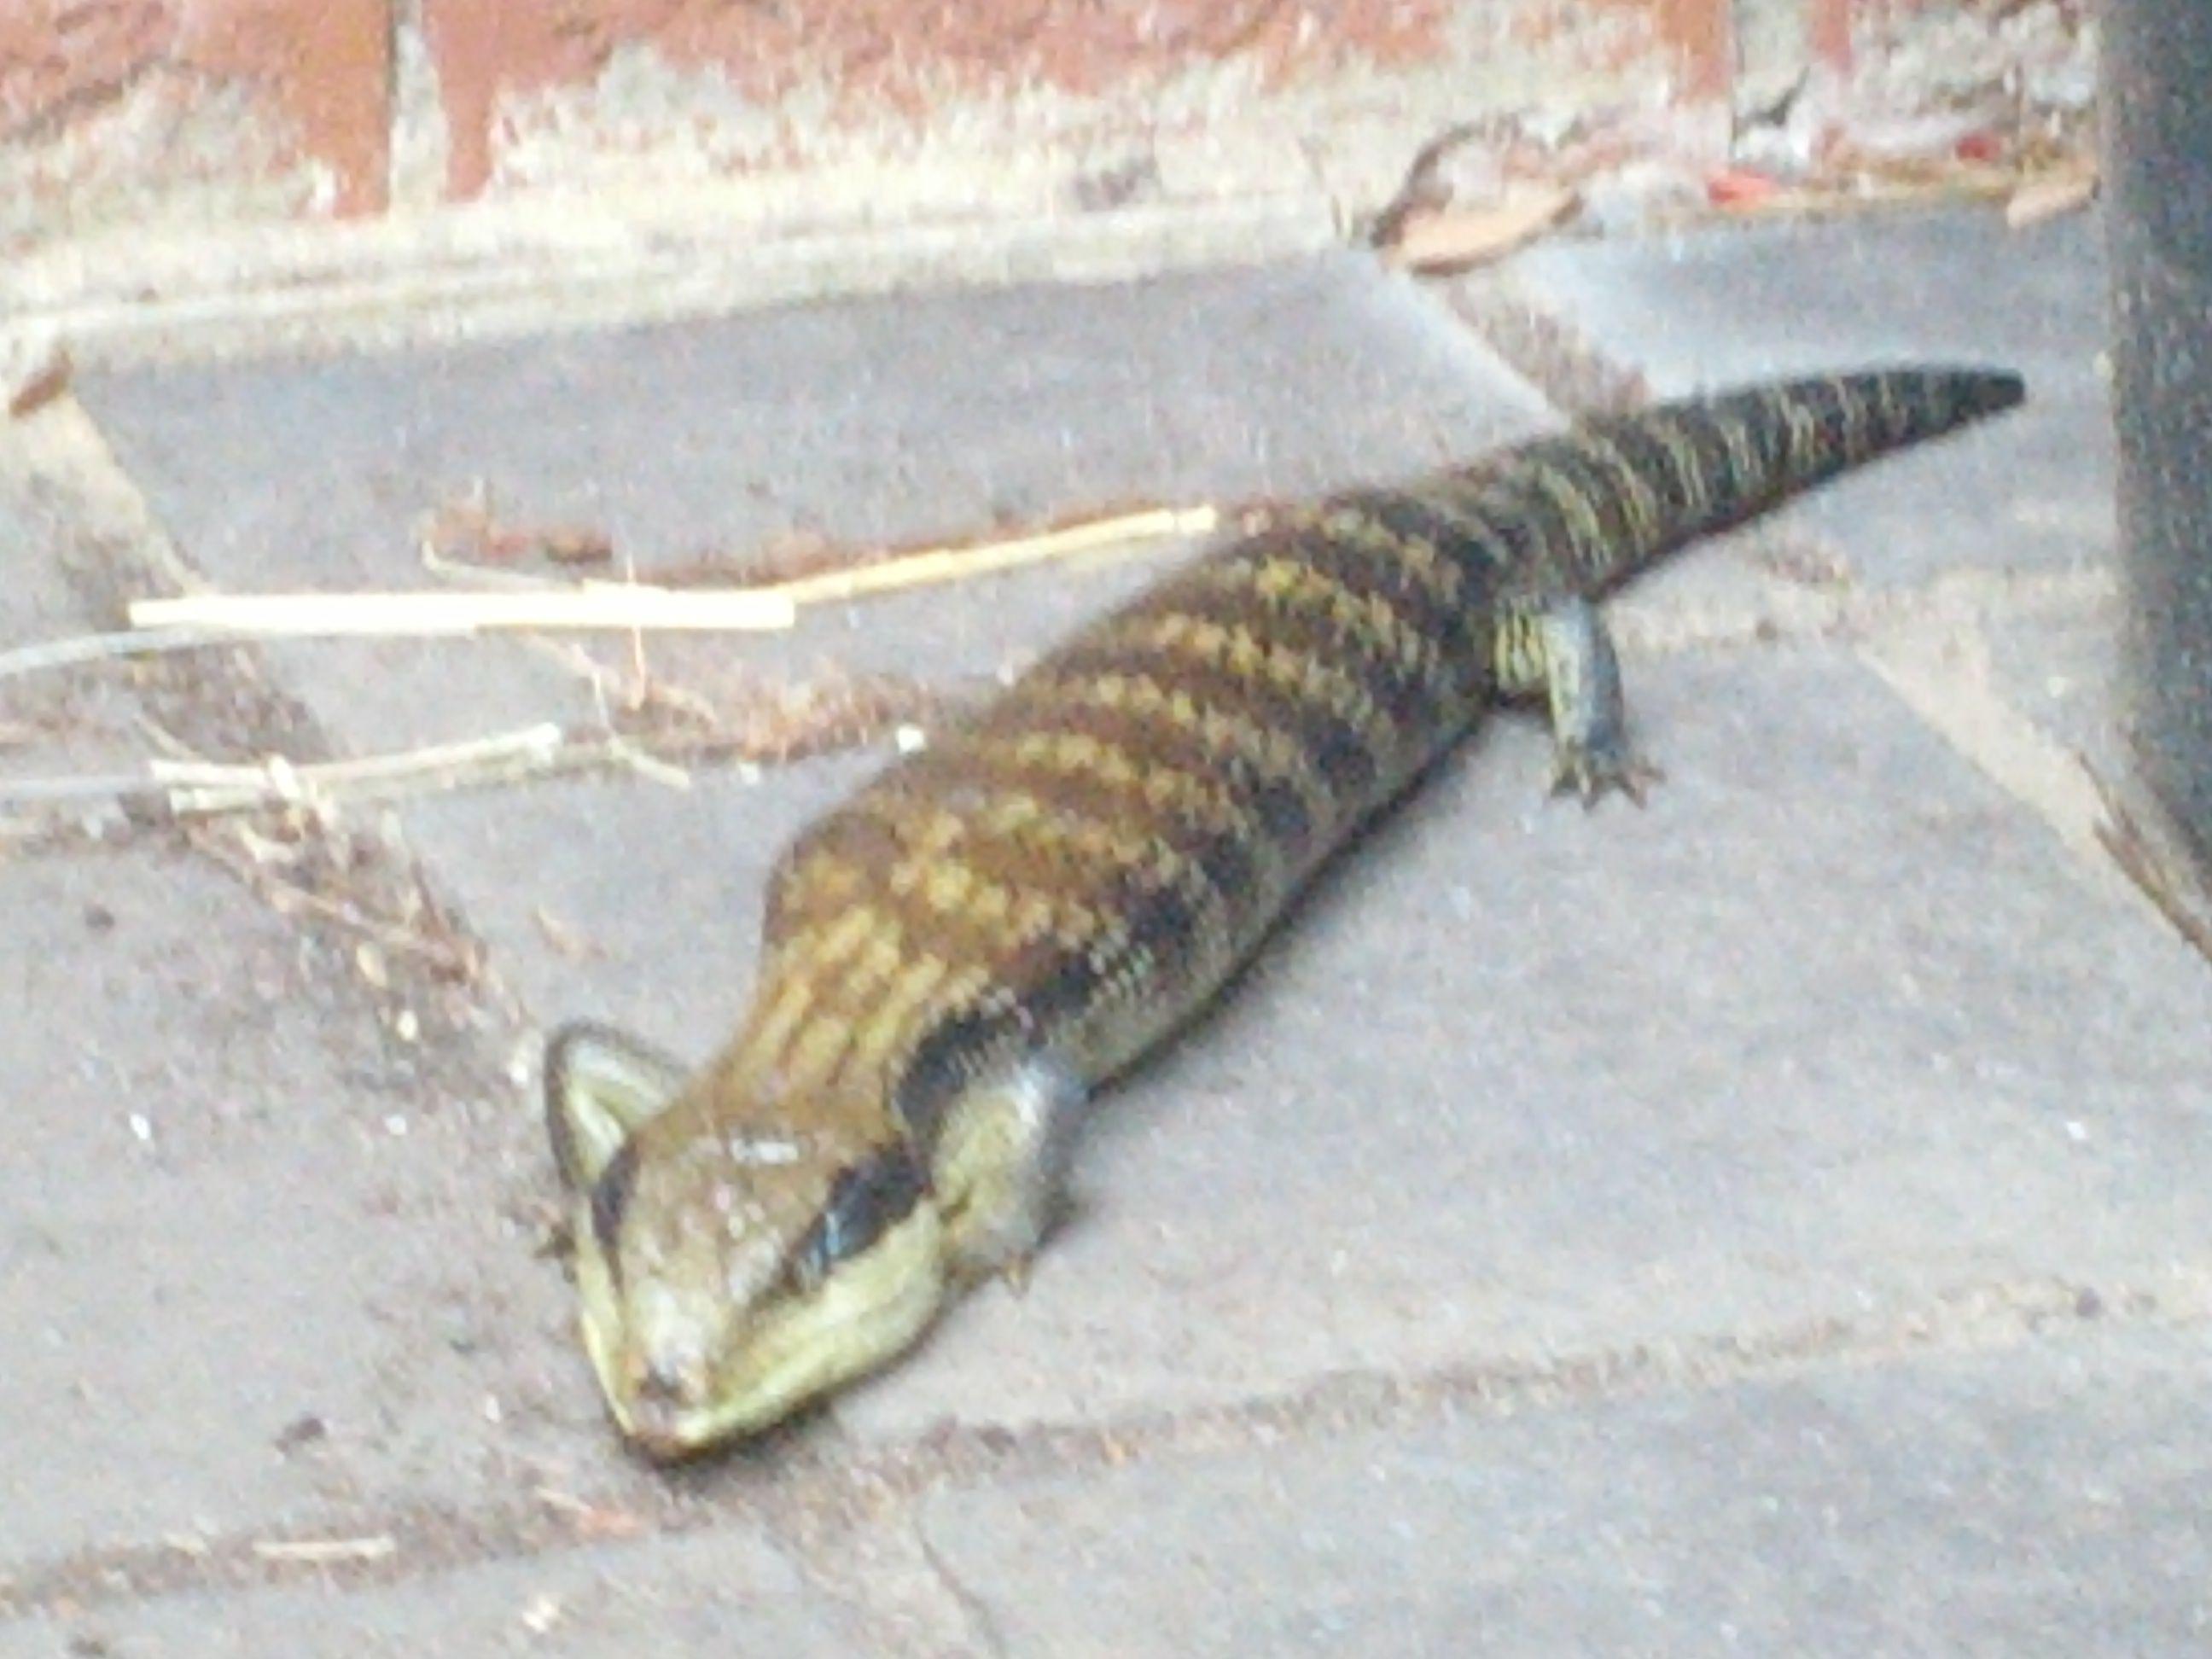 What Do Backyard Lizards Eat | Backyard Ideas